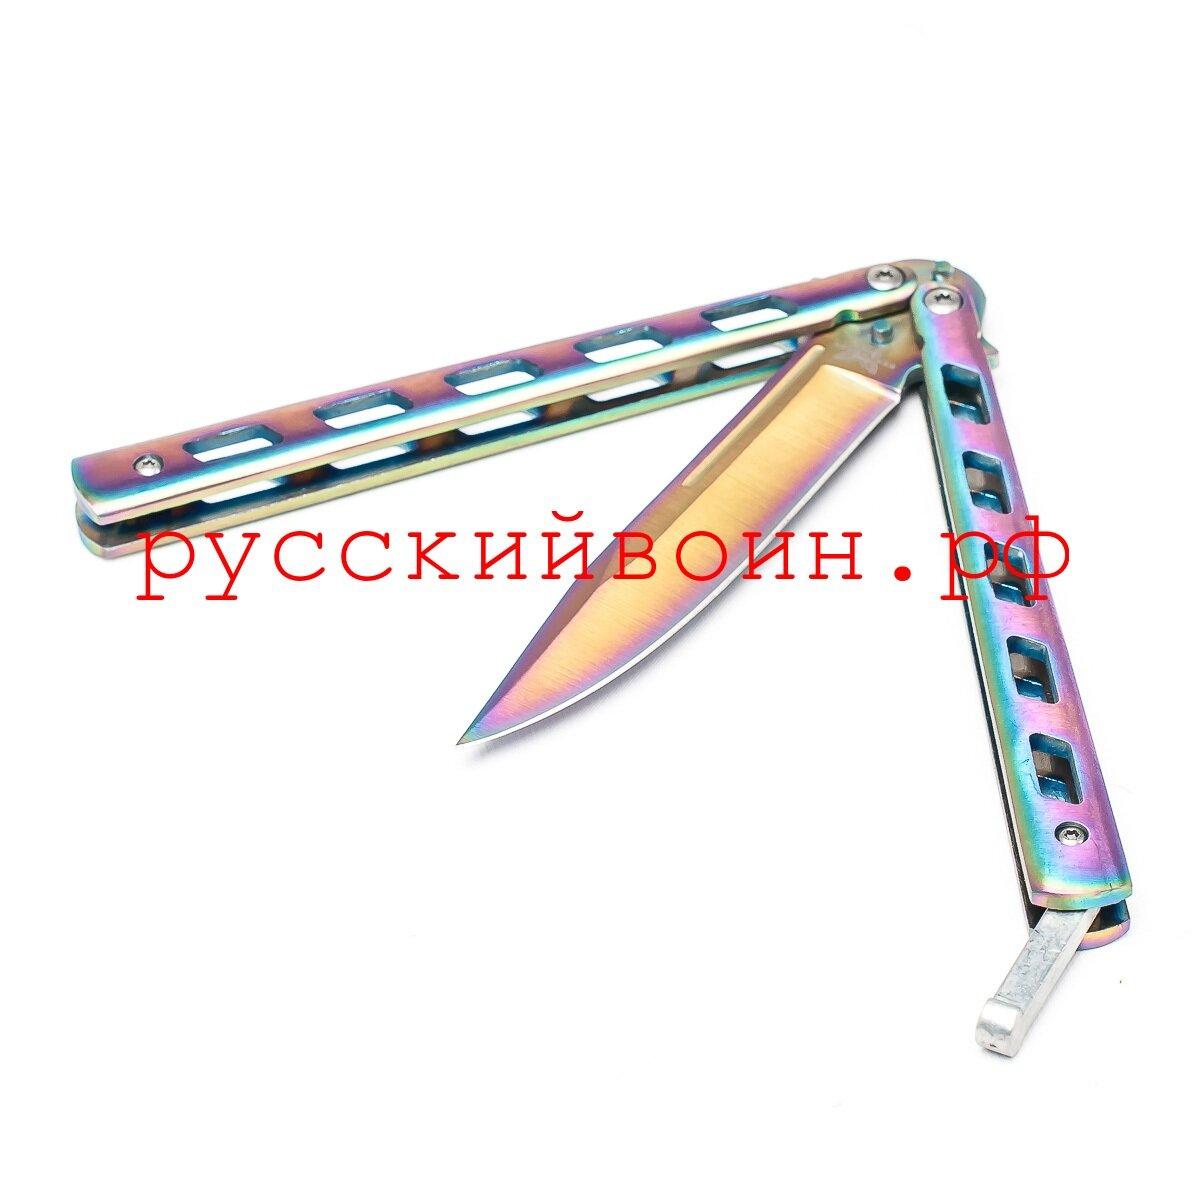 Нож-бабочка Бензин Градиент